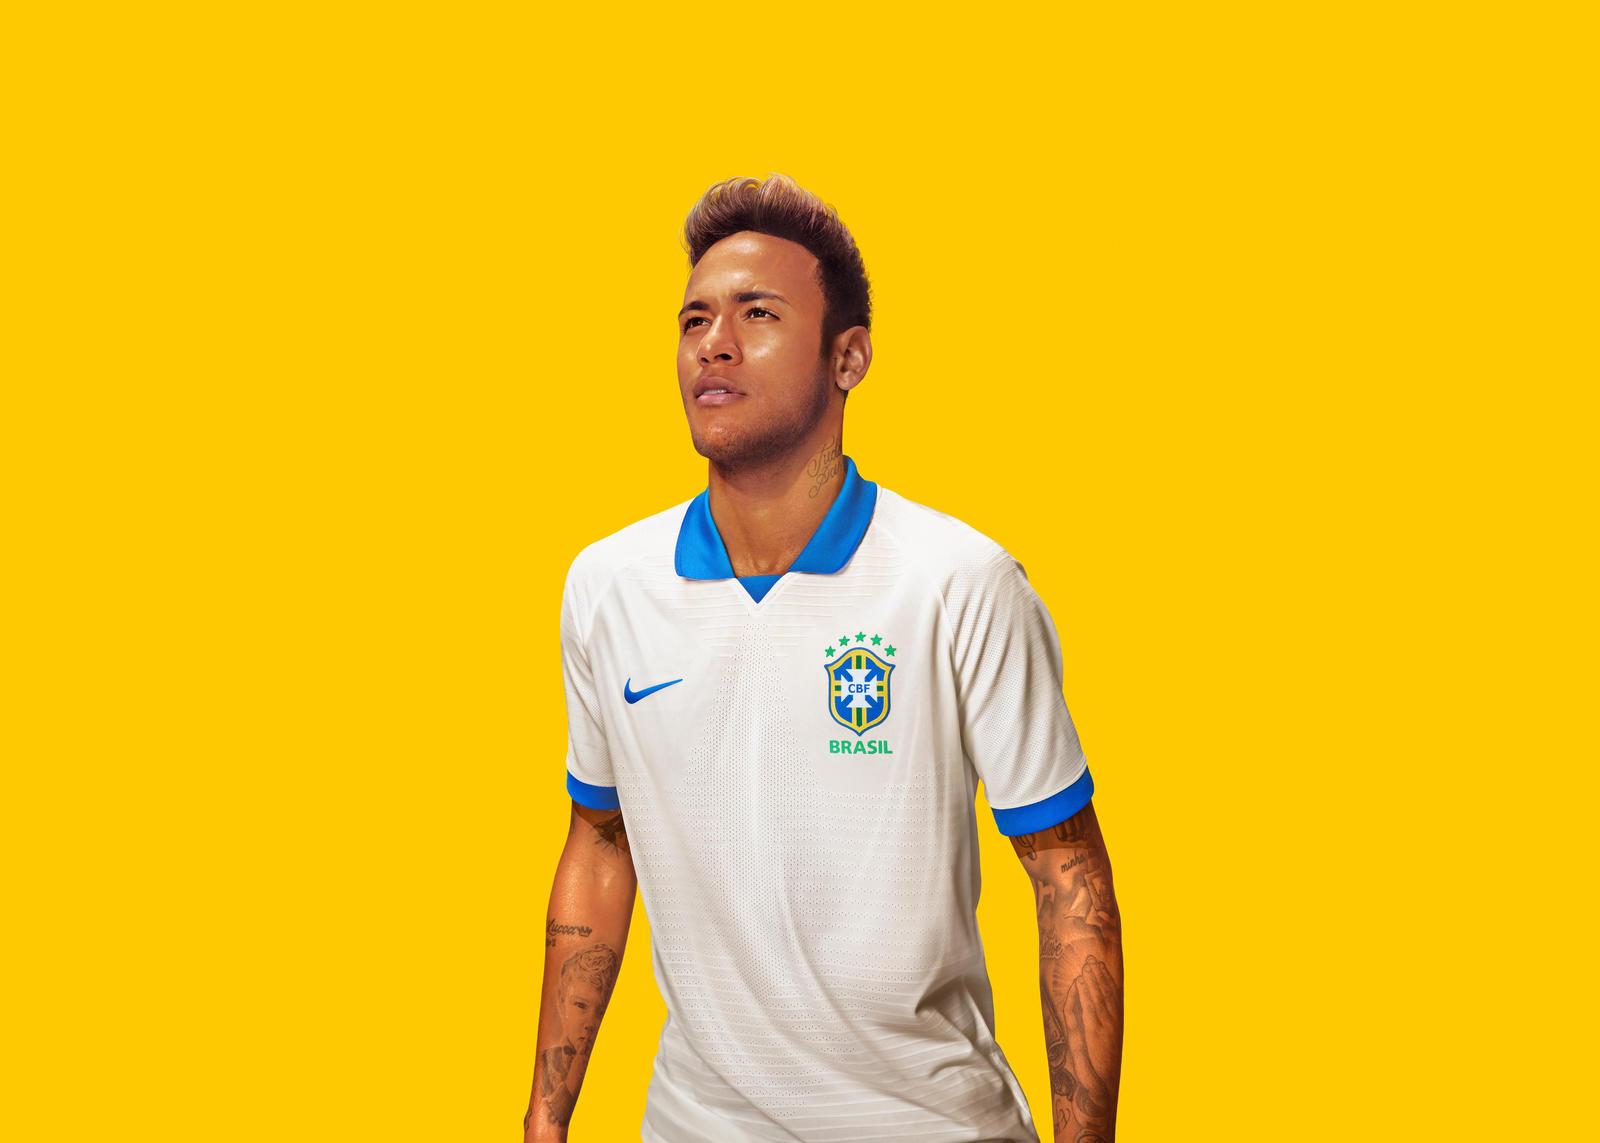 Nike 2019-20 Brasil Copa America 100th Anniversary Jersey Seleção Brasileira Collection 4